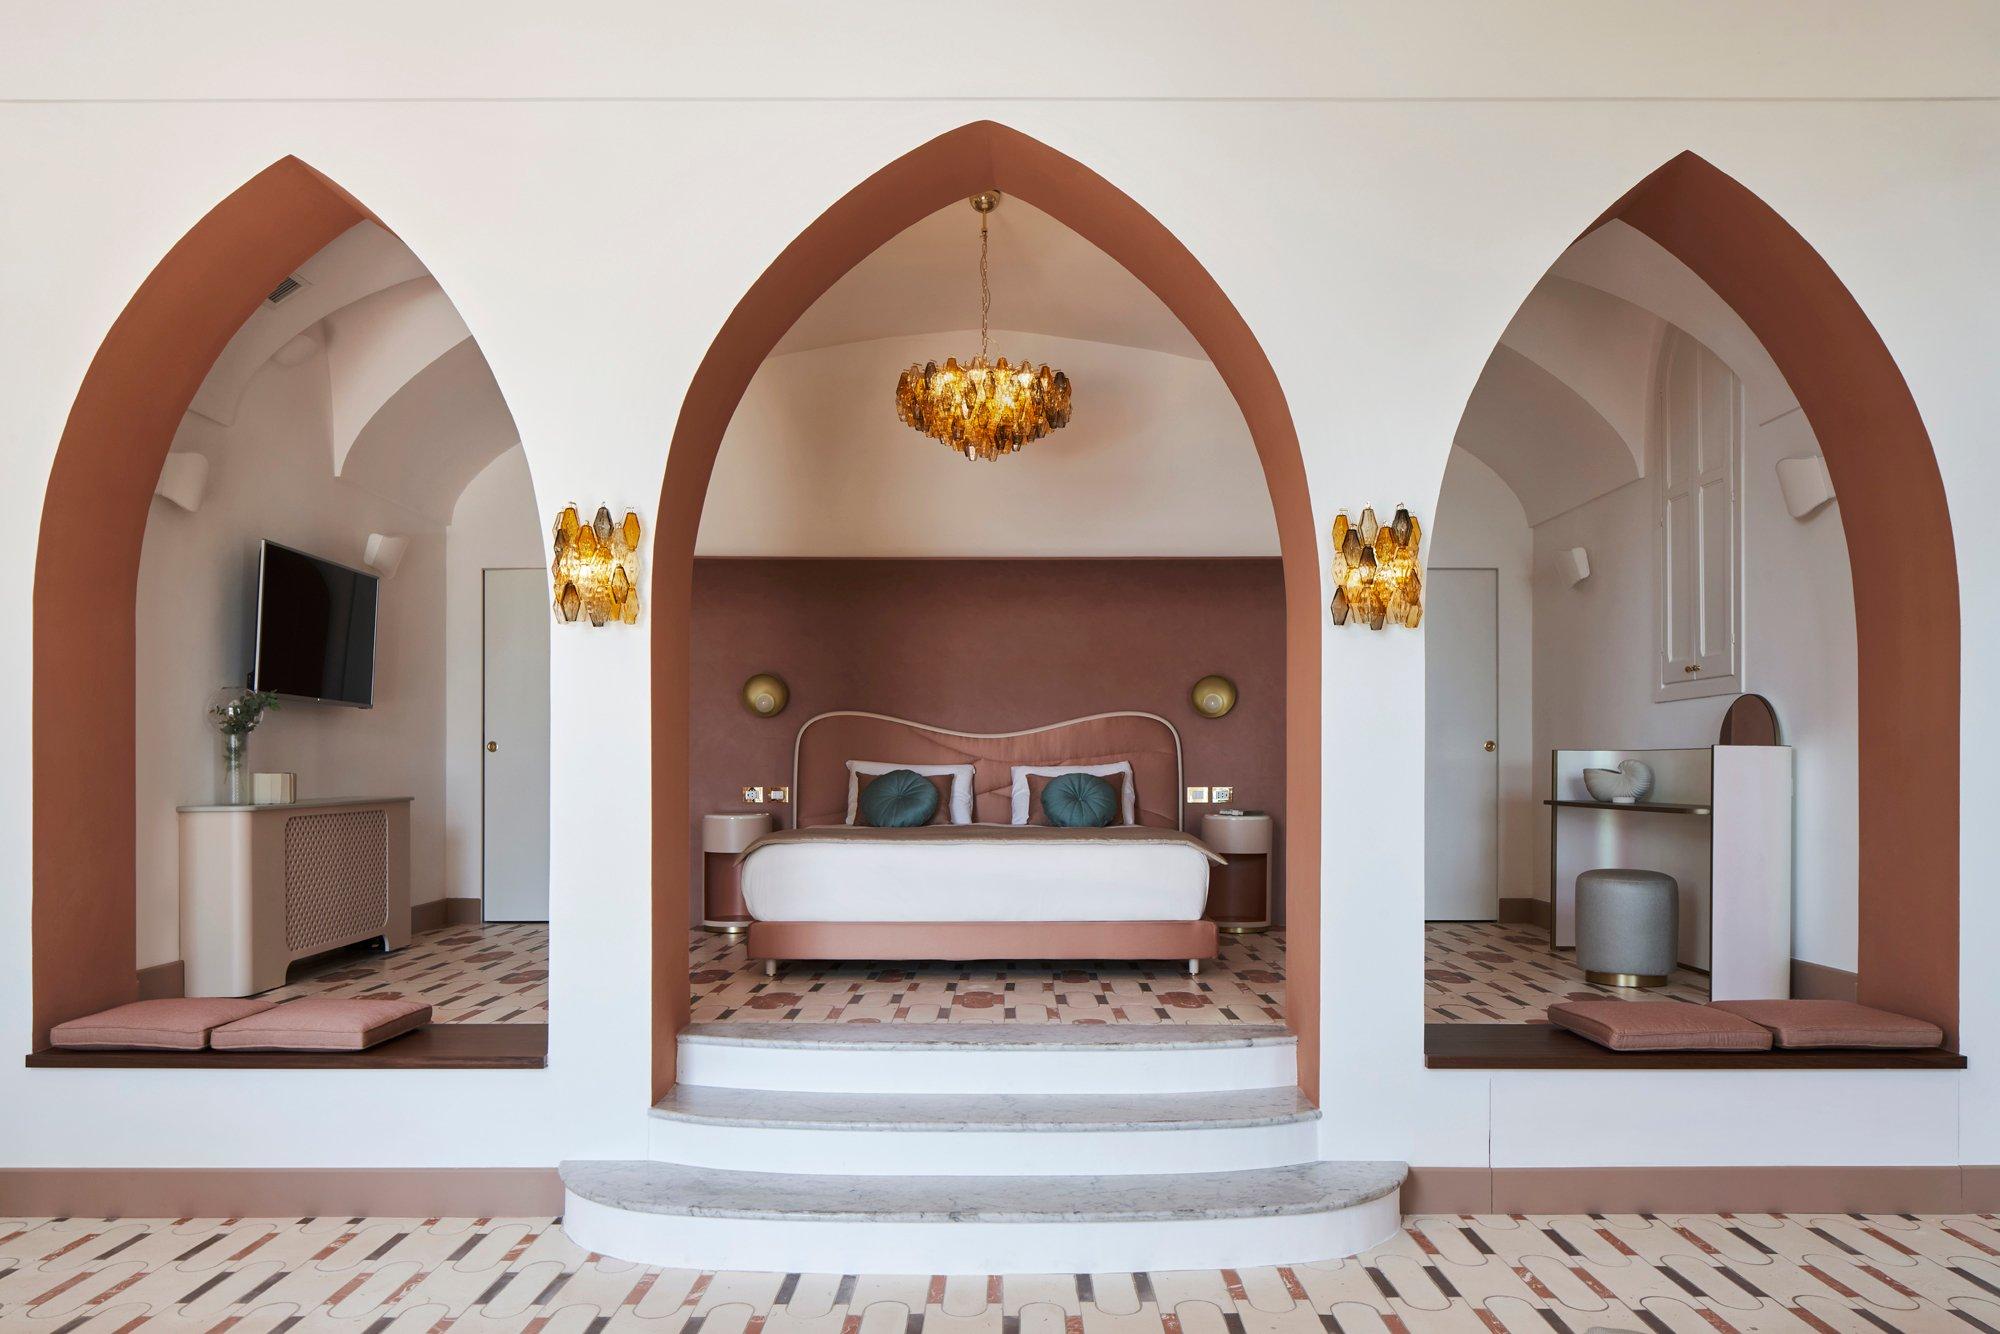 Belvedere Suite im Hotel Palazzo Avino in Ravello an der Amalfiküste. Foto: Davide Lovatti